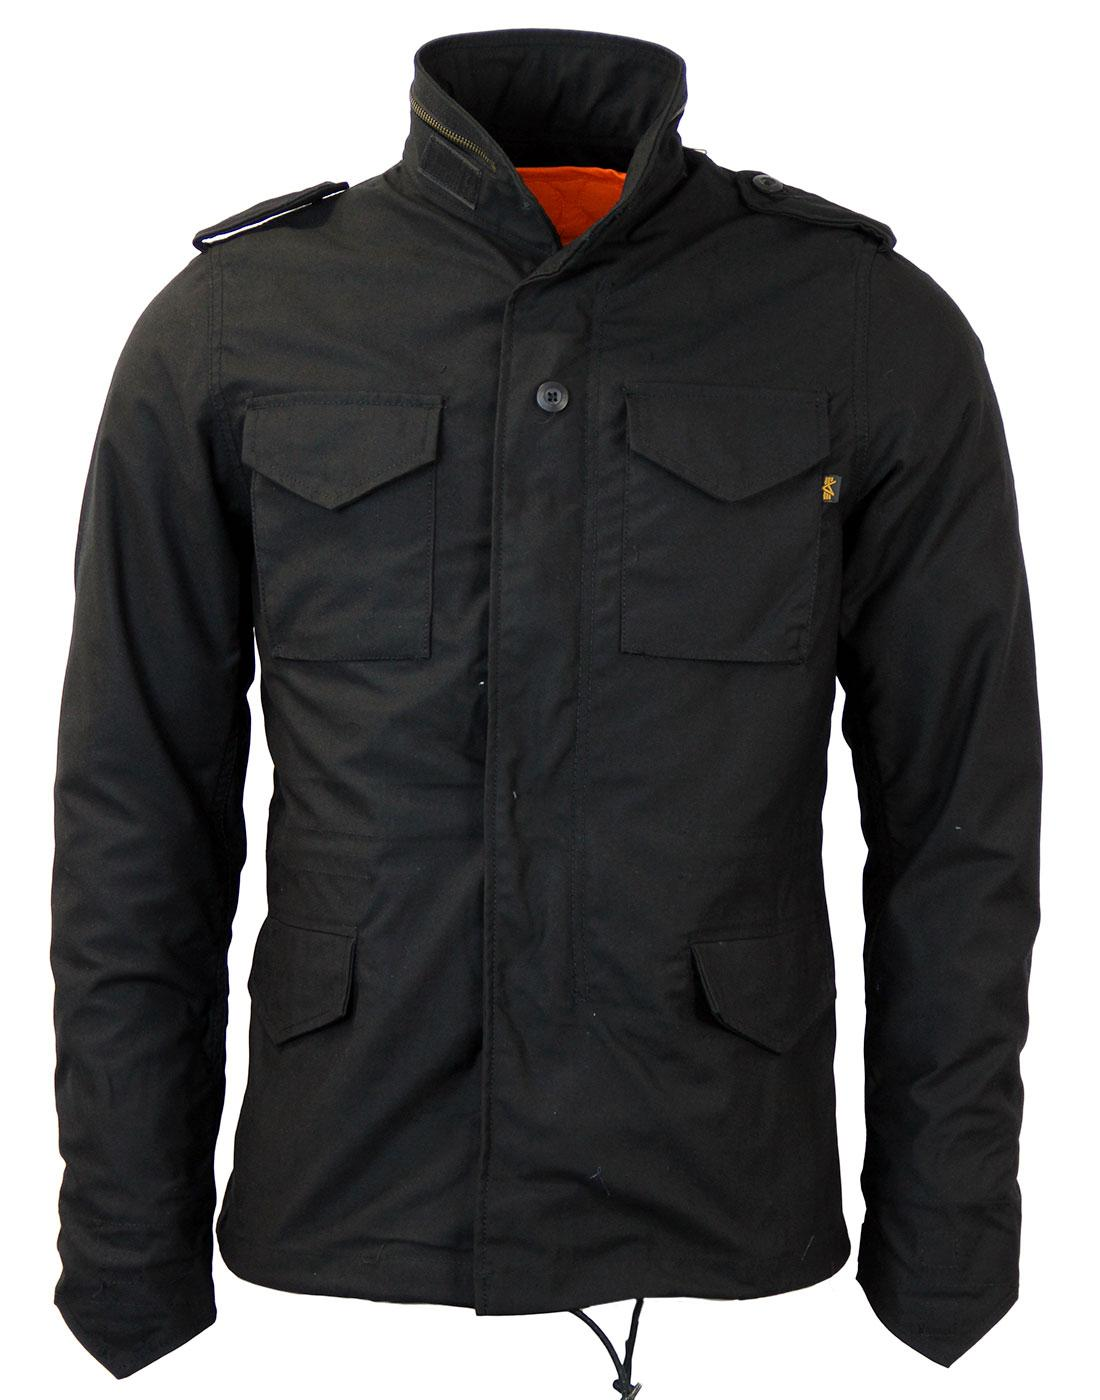 alpha industries m 65 heritage retro mod field jacket in black. Black Bedroom Furniture Sets. Home Design Ideas